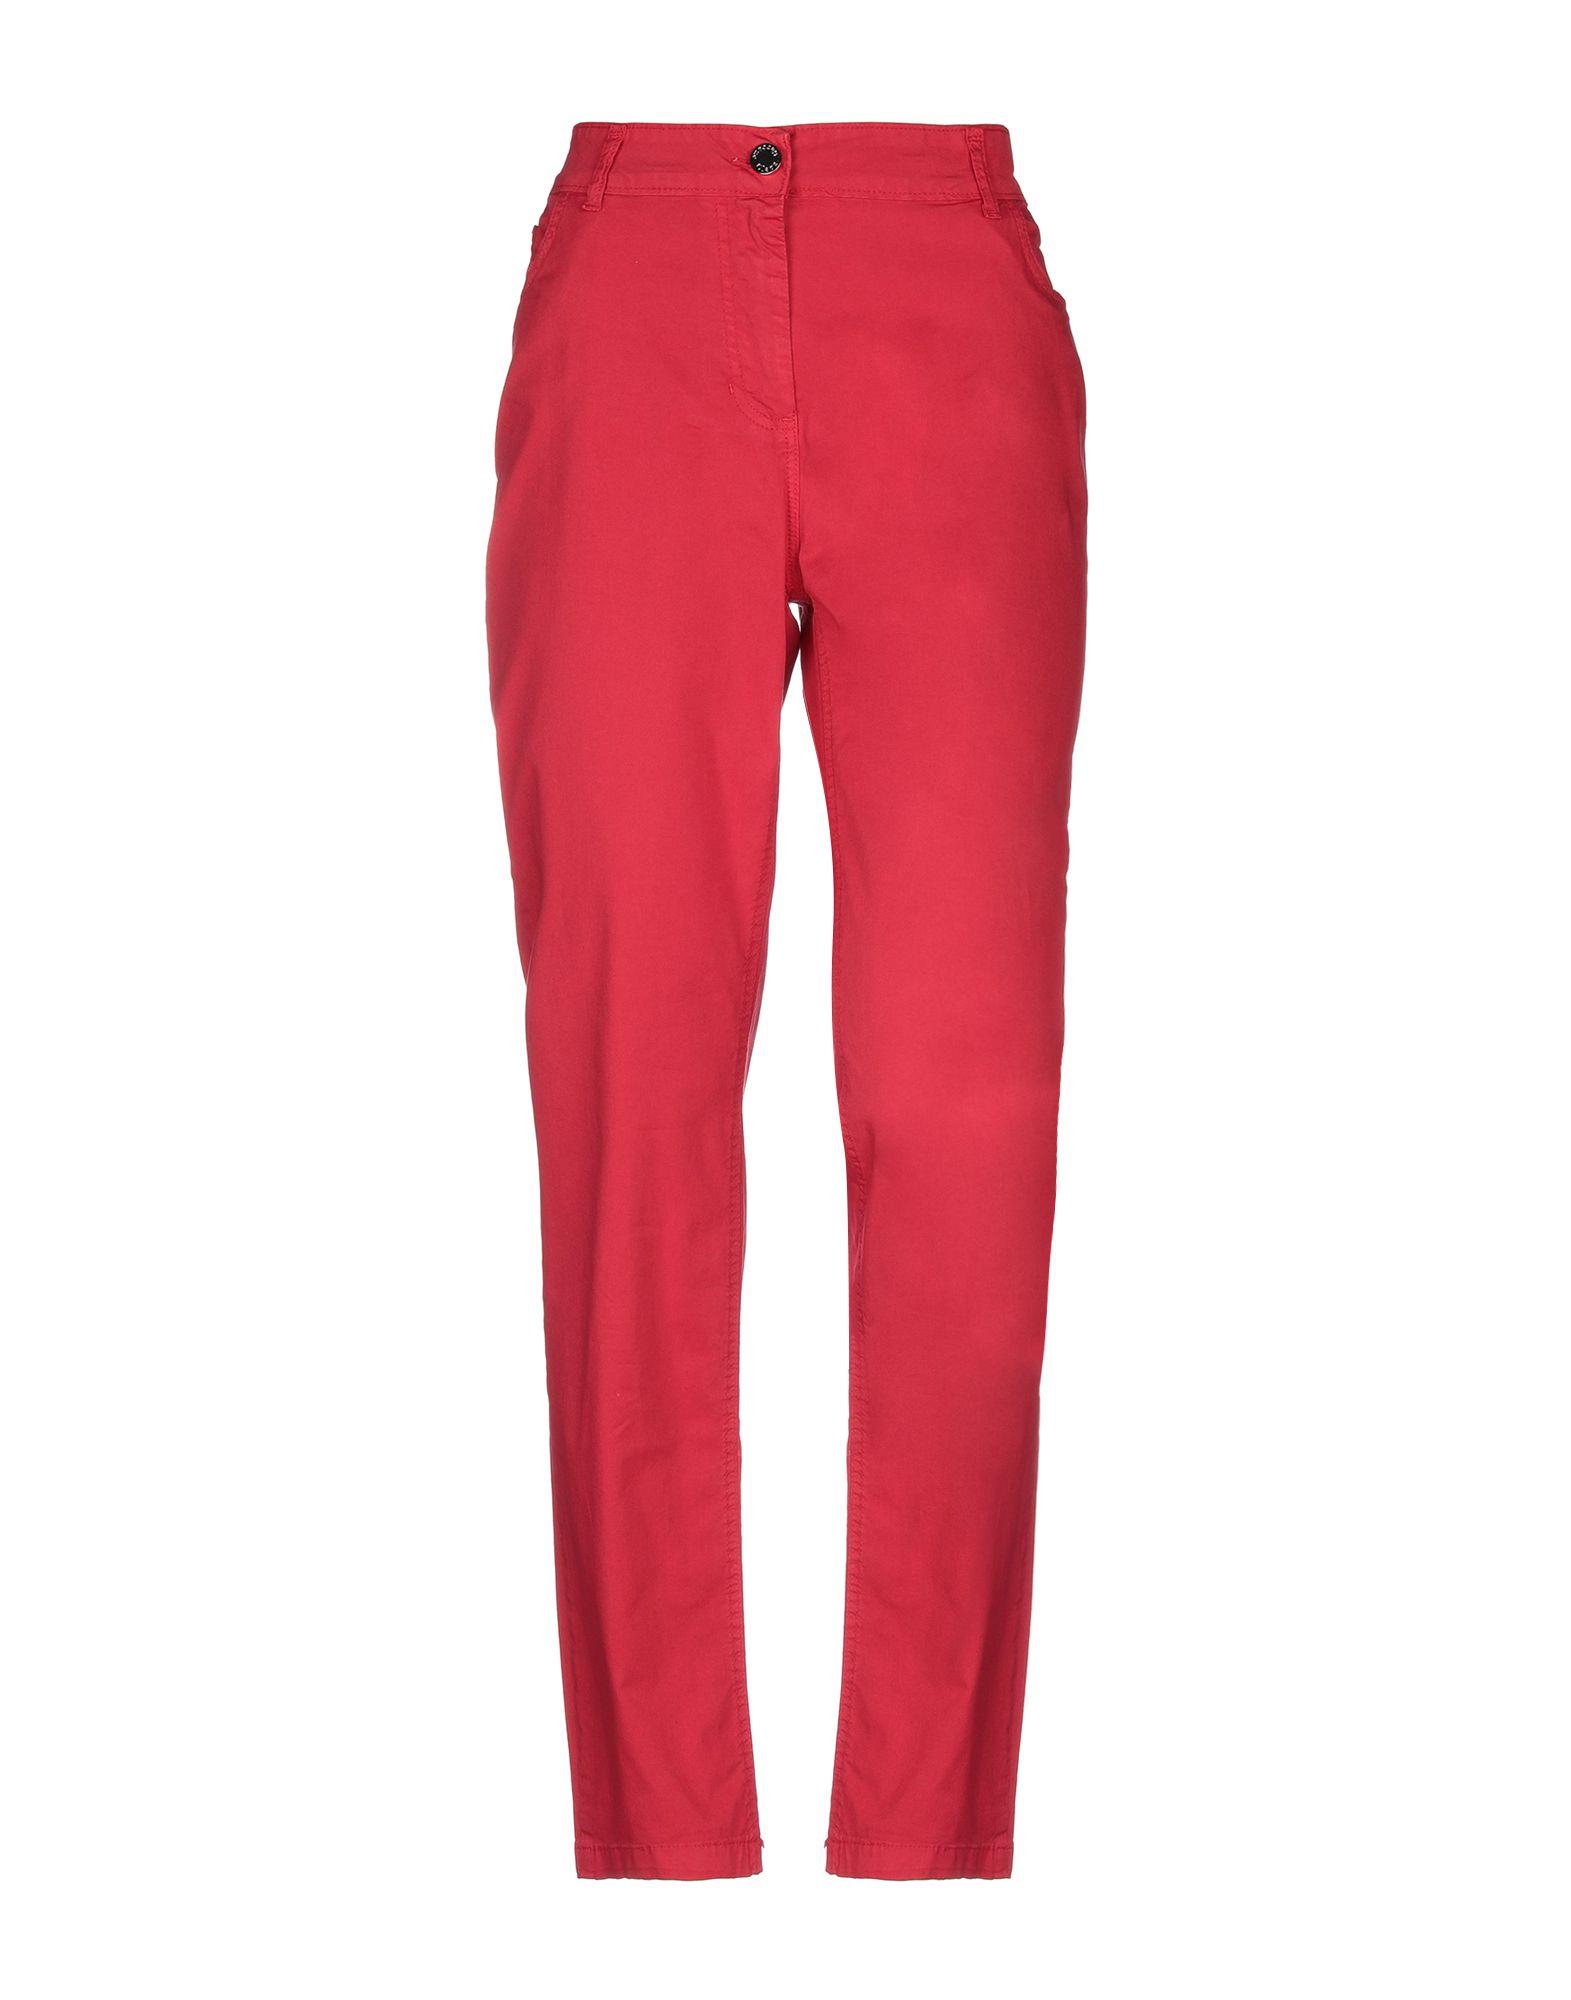 OLTRE TEMPO Повседневные брюки blue oltre r5 jtr5860